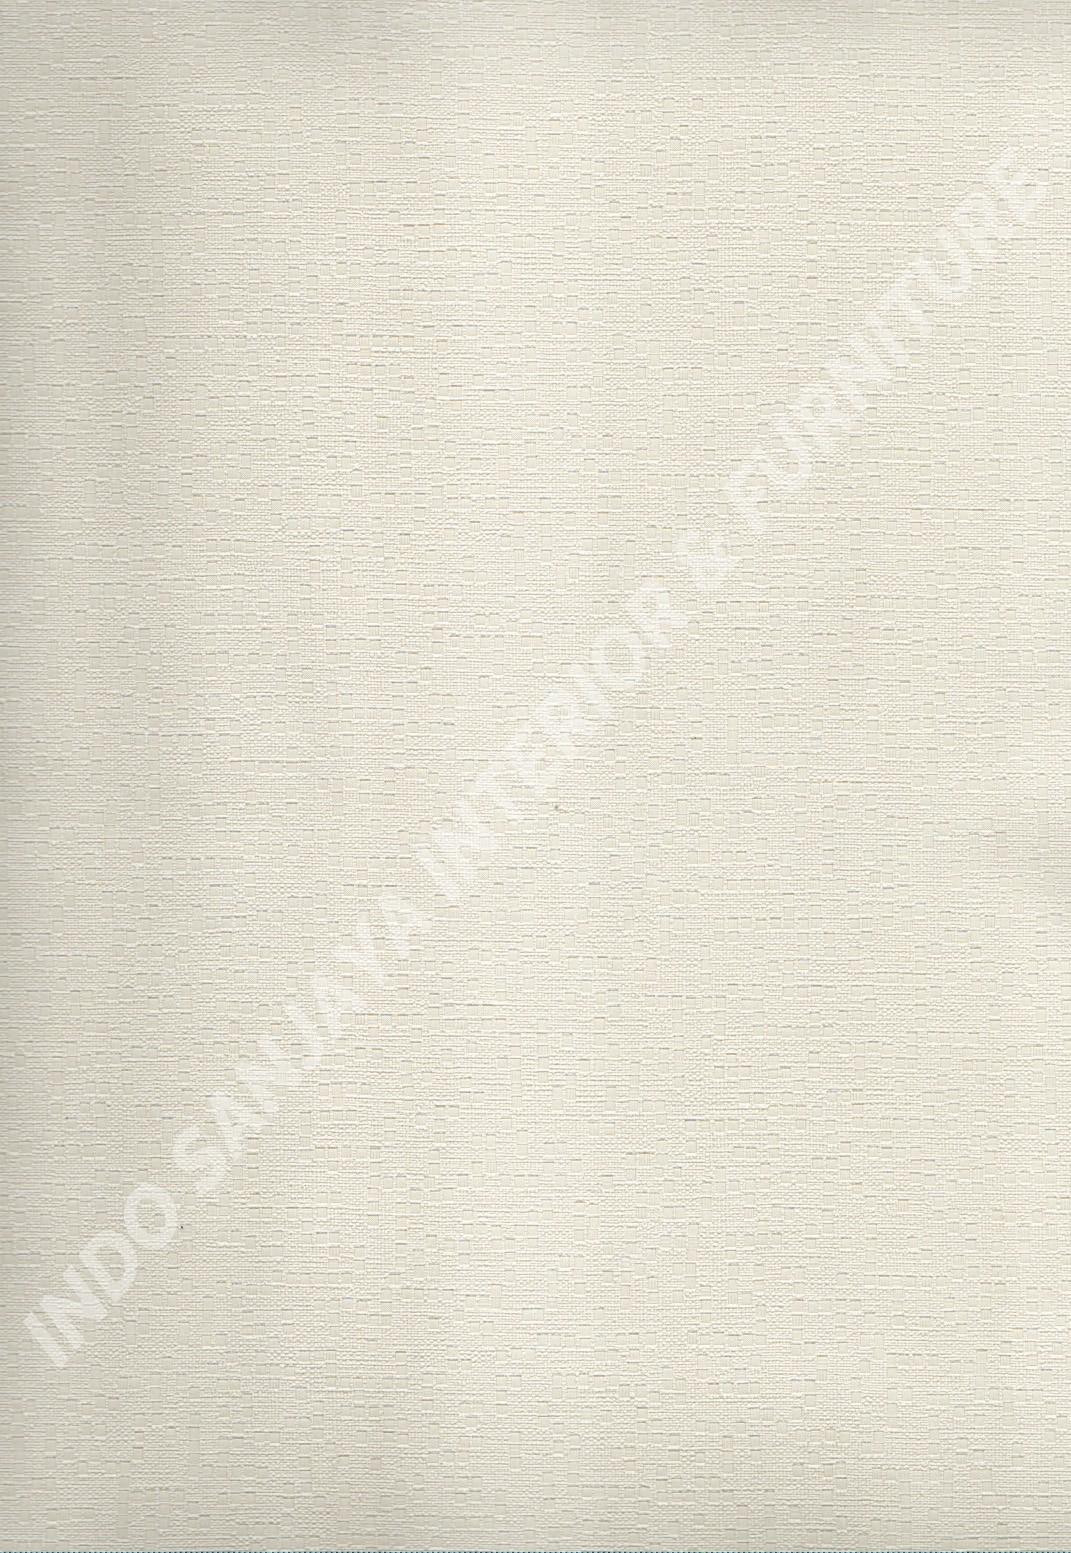 wallpaper   Wallpaper Minimalis Polos 3065:3065 corak  warna